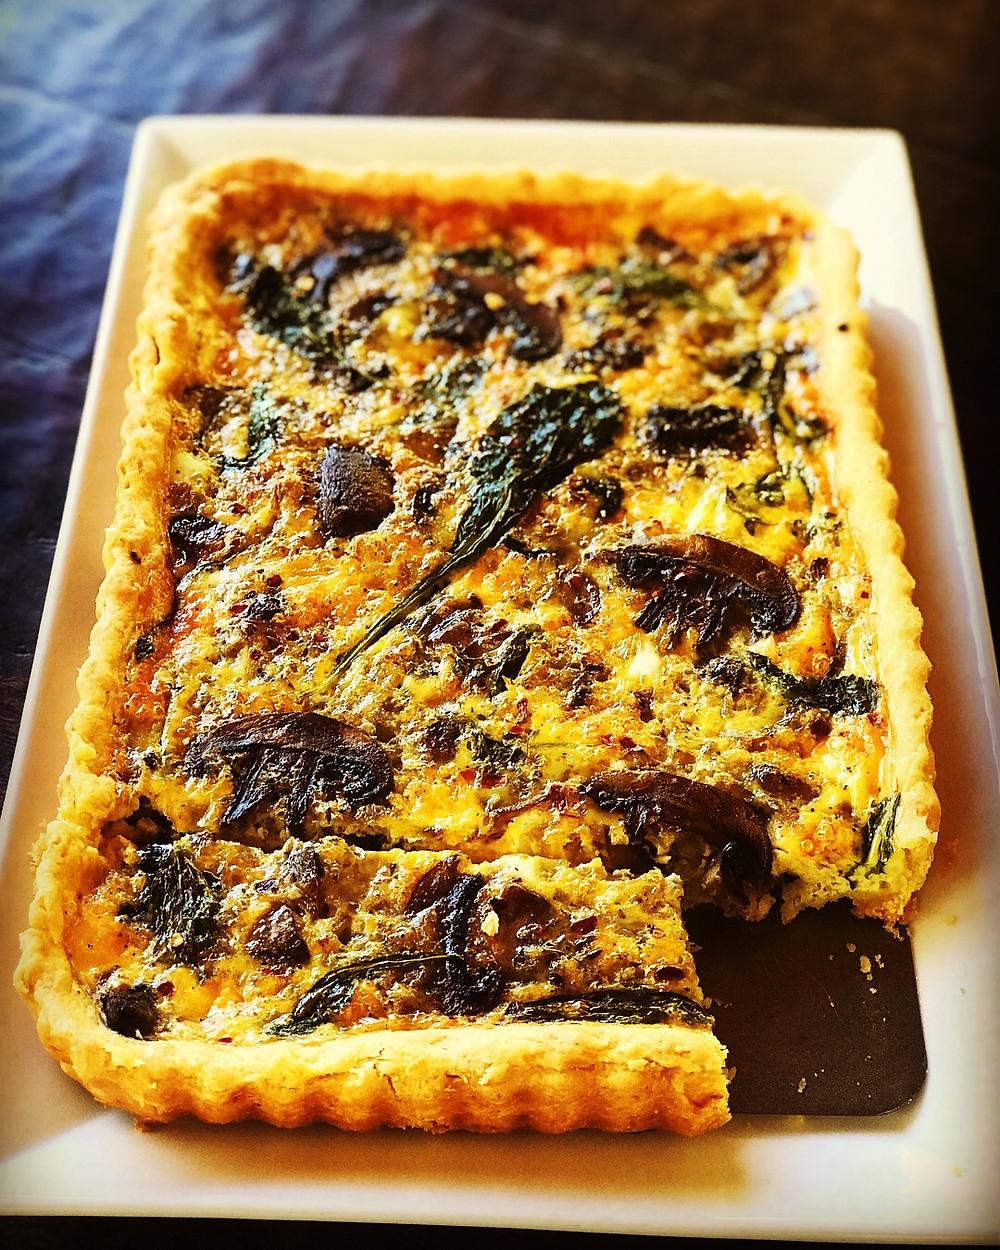 Sourdough Crust and Mushroom Cheese Quiche